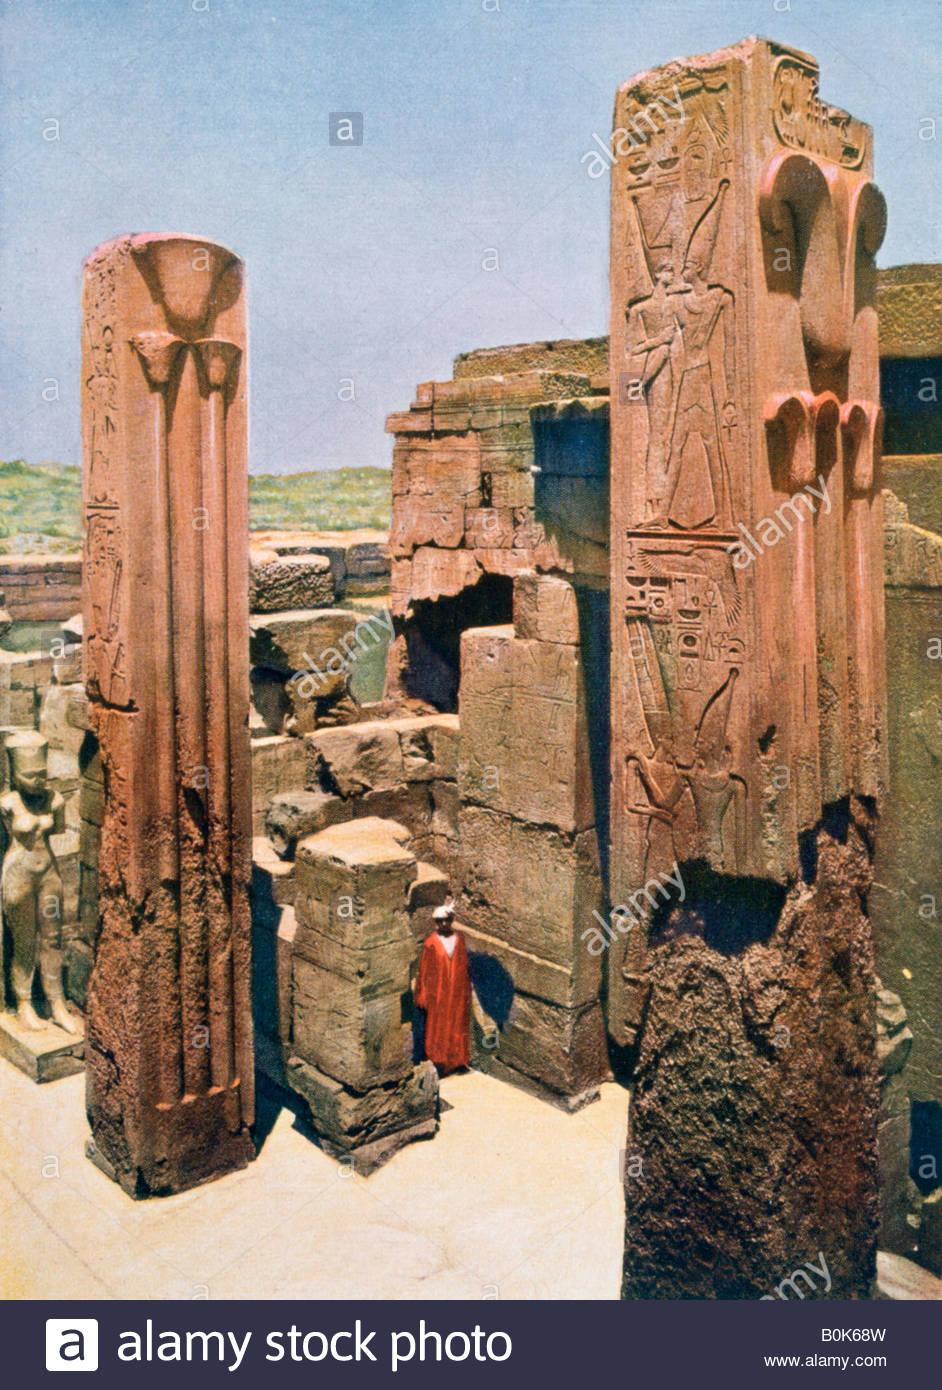 Amun Re Photographic Arts: Temple Of Amun Stock Photos & Temple Of Amun Stock Images